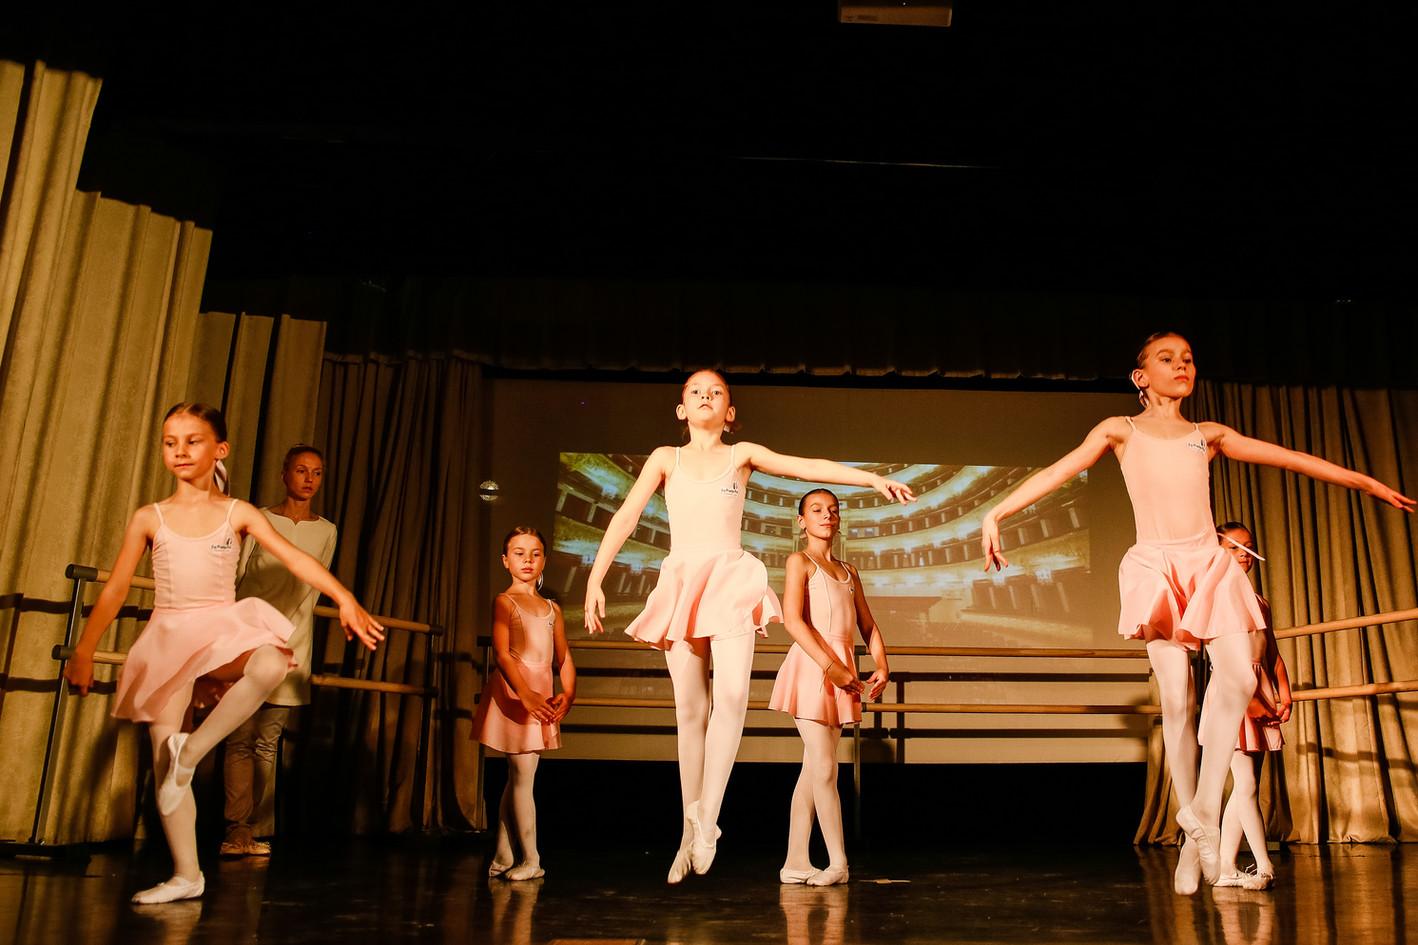 Le Premier Pas Балерины прыжок